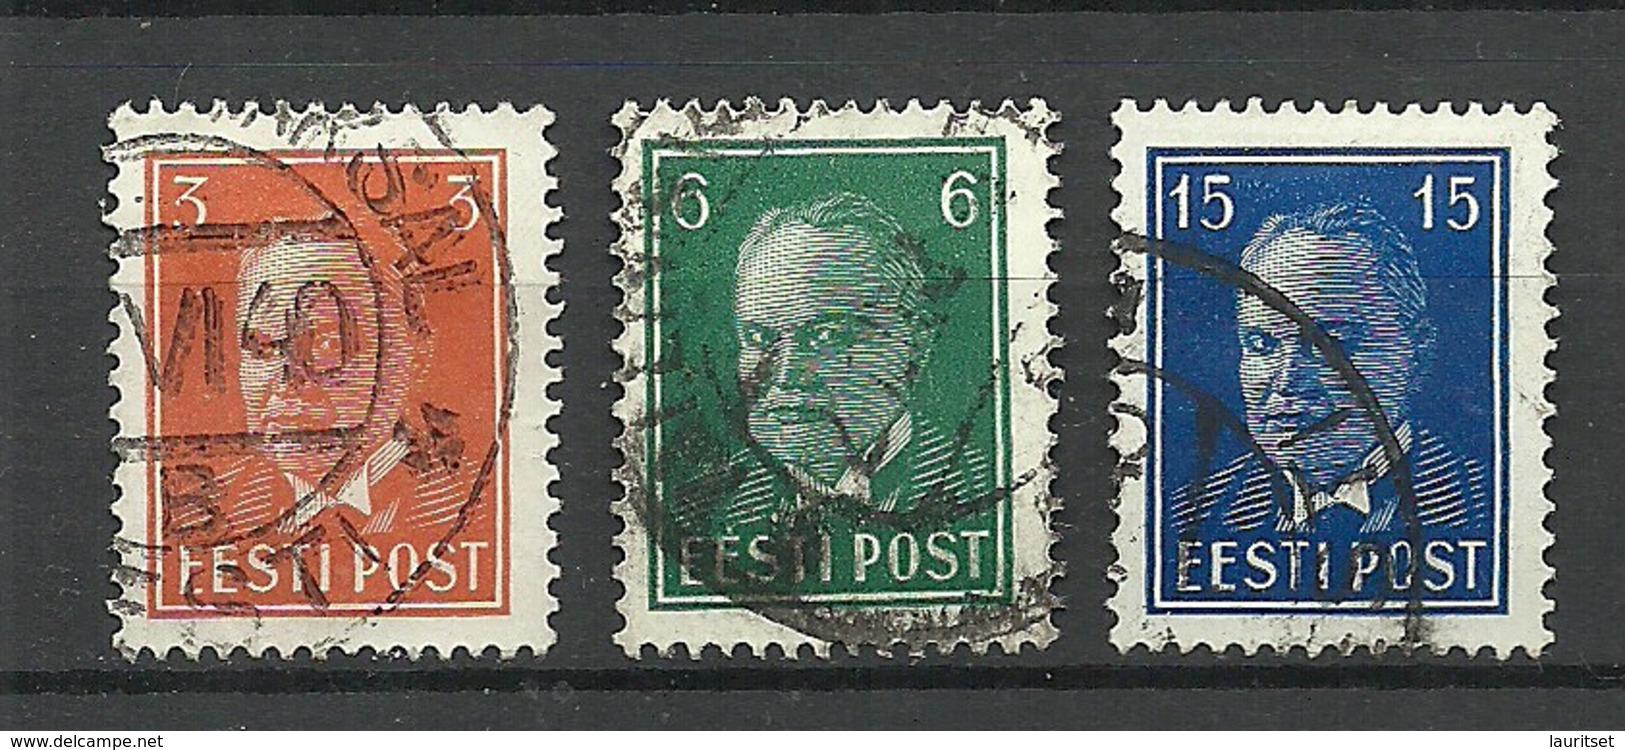 ESTLAND ESTONIA 1940 Michel 156 - 158 O - Estland